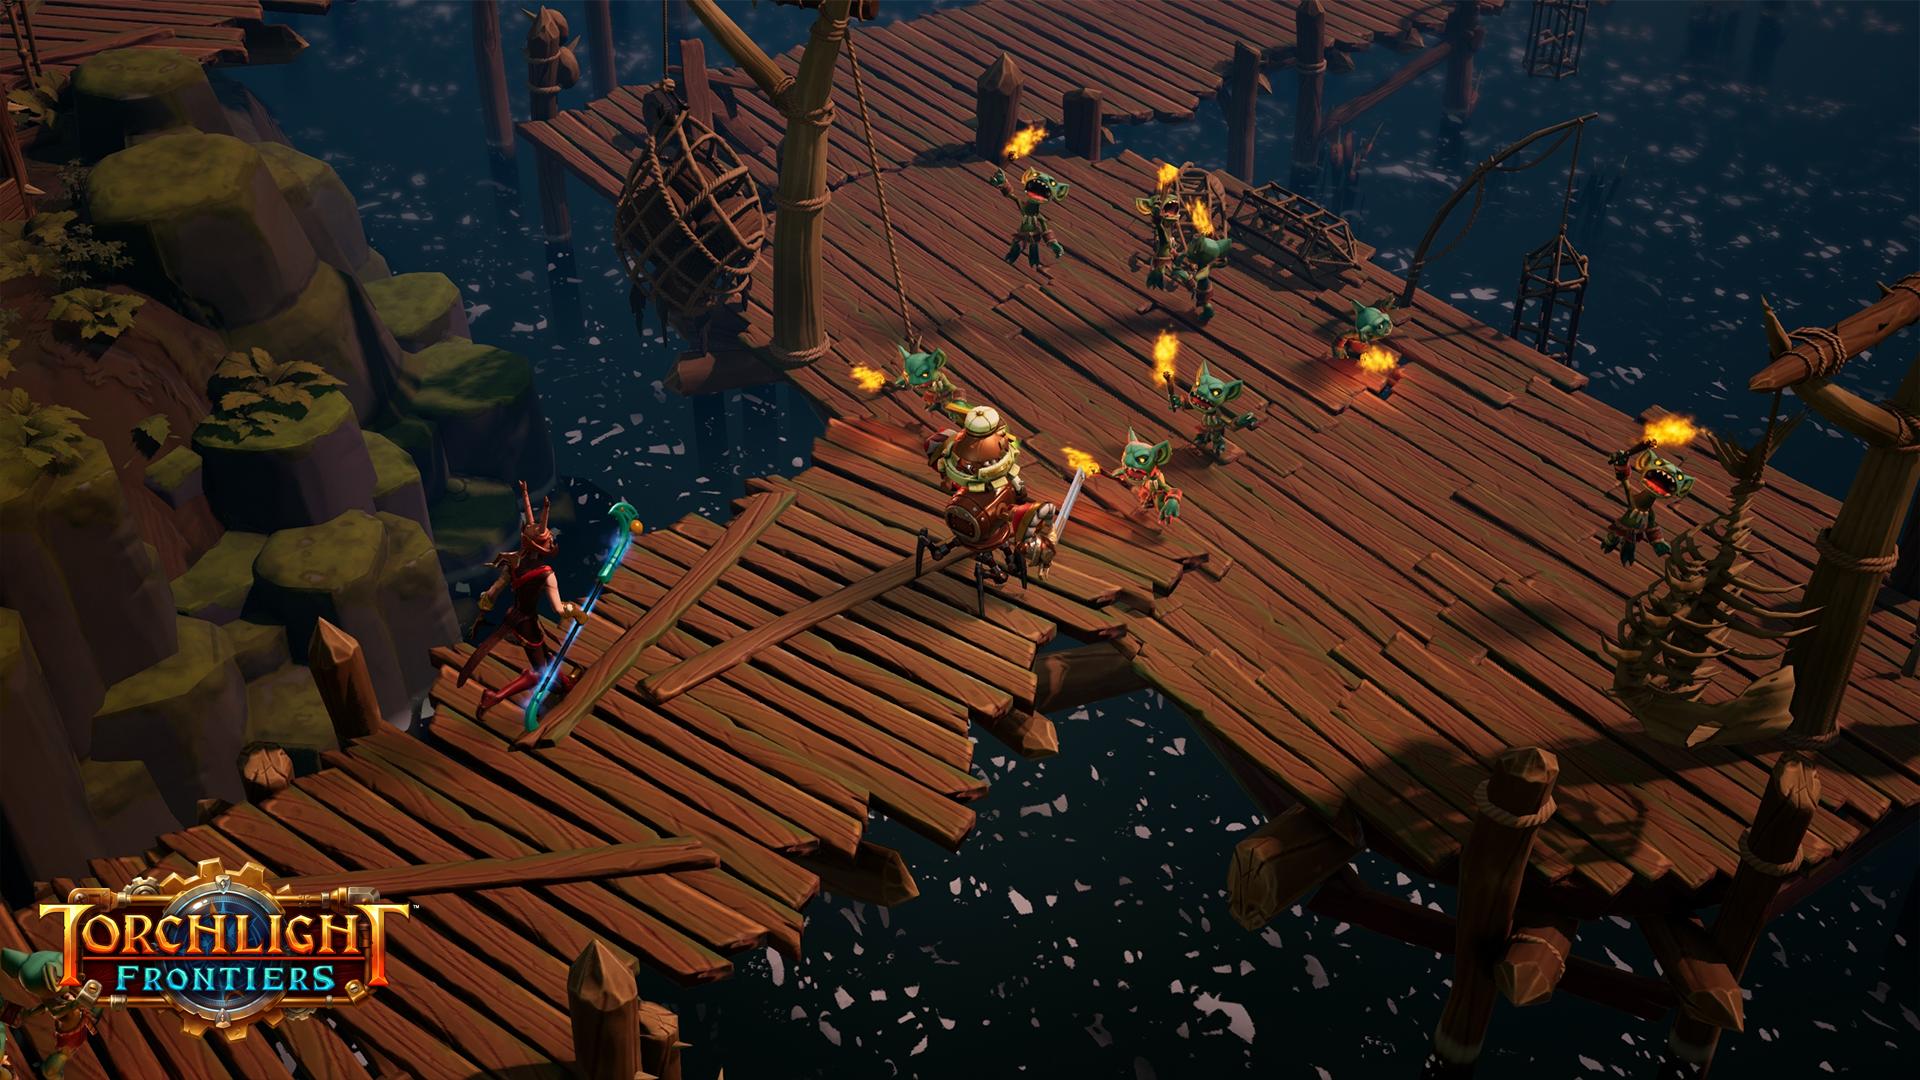 TorchlightFrontiers_Gameplay_Screenshots_01.png